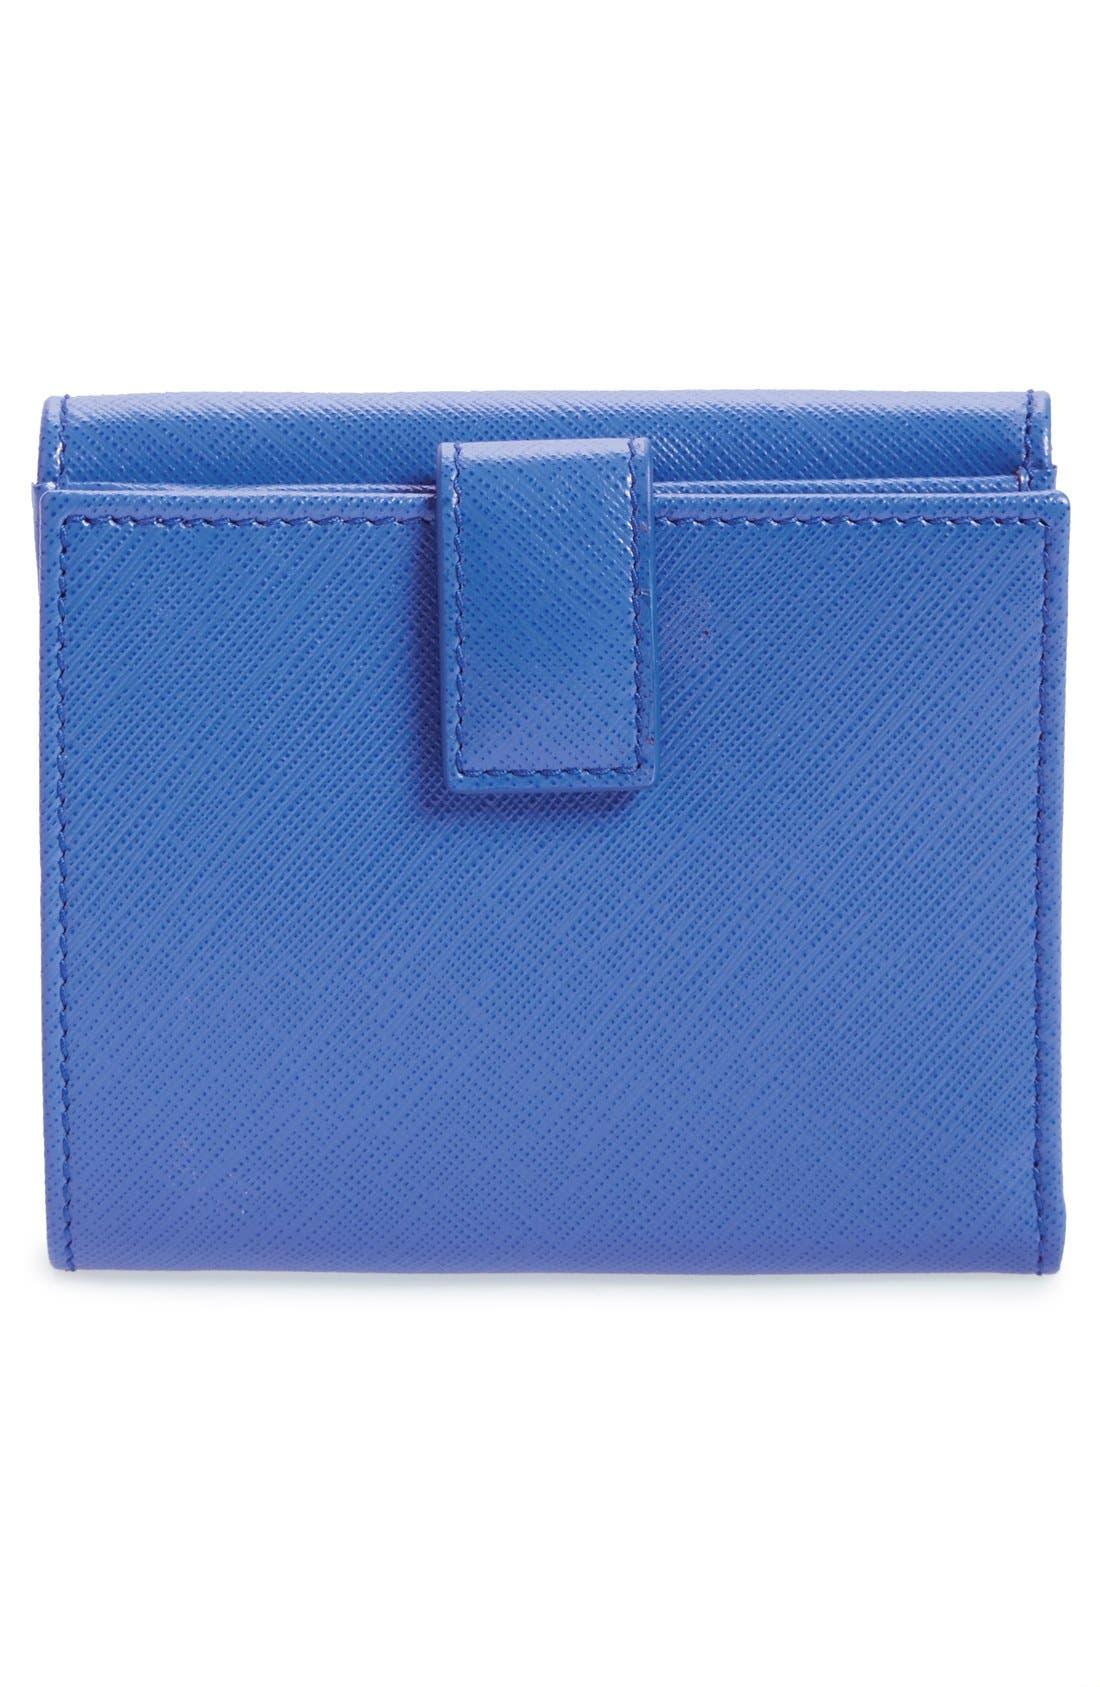 Alternate Image 4  - Salvatore Ferragamo Saffiano Calfskin Leather Wallet